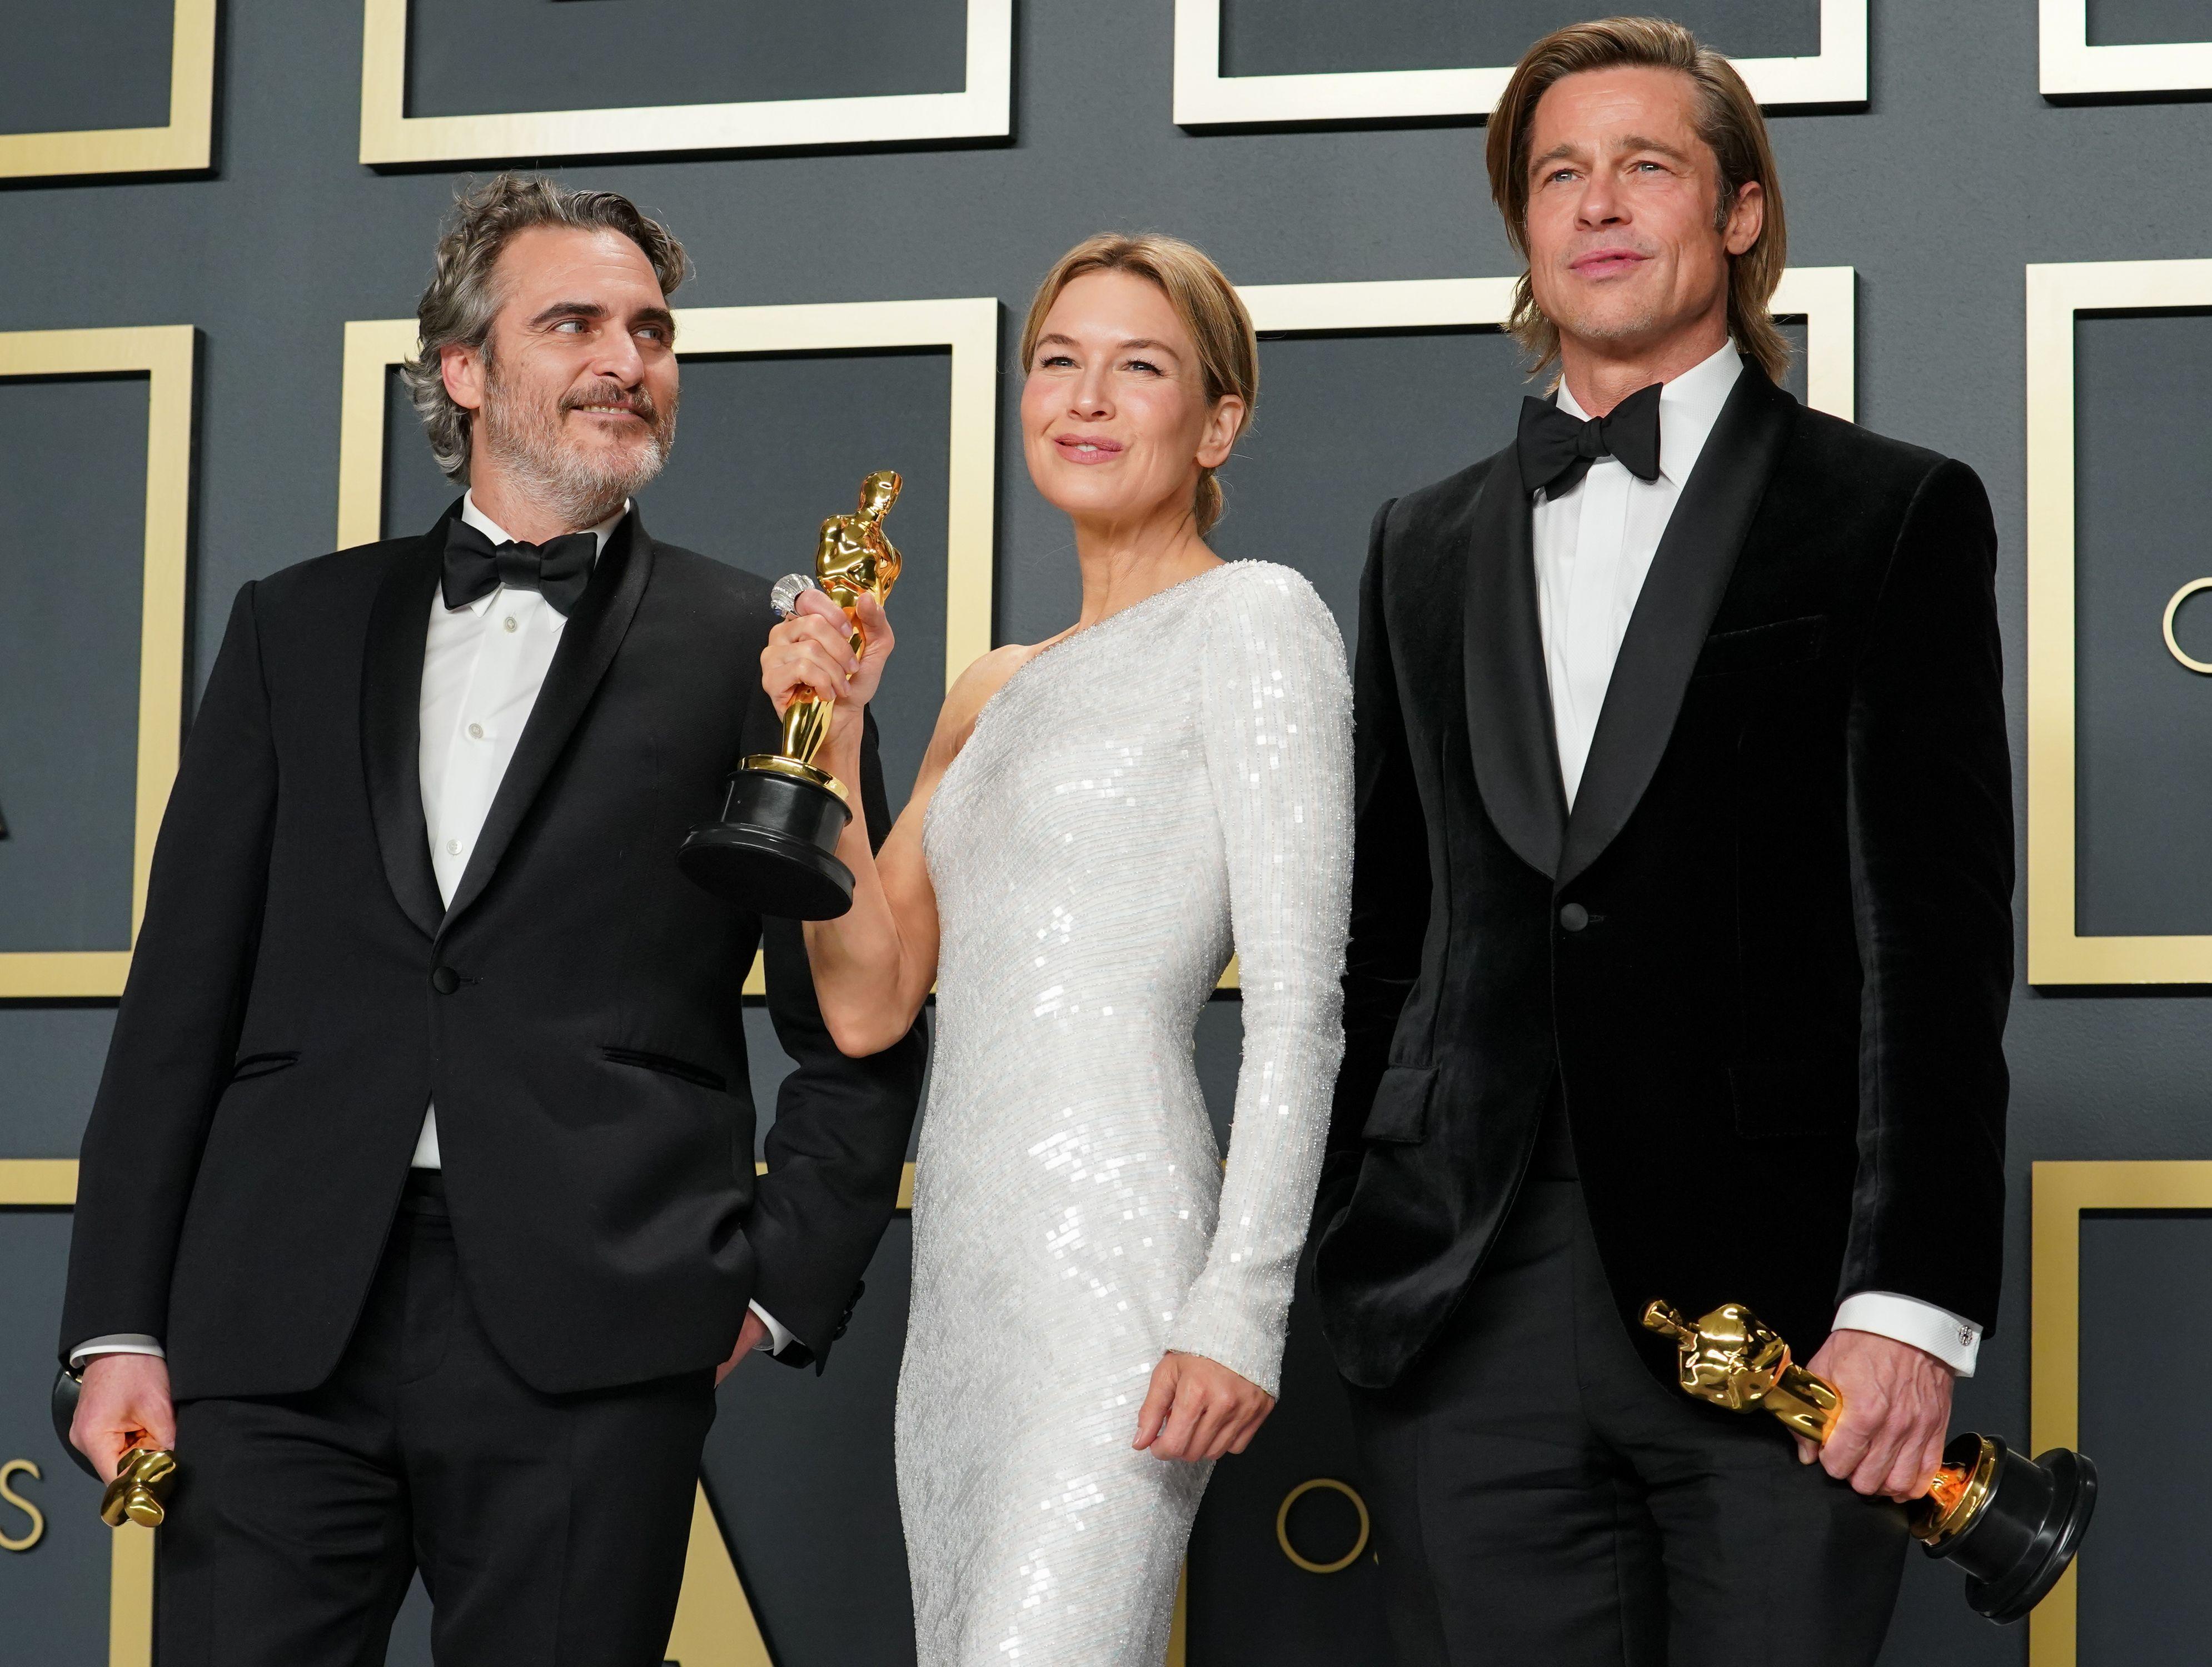 The Oscars goodie bag was worth an impressive £174,000